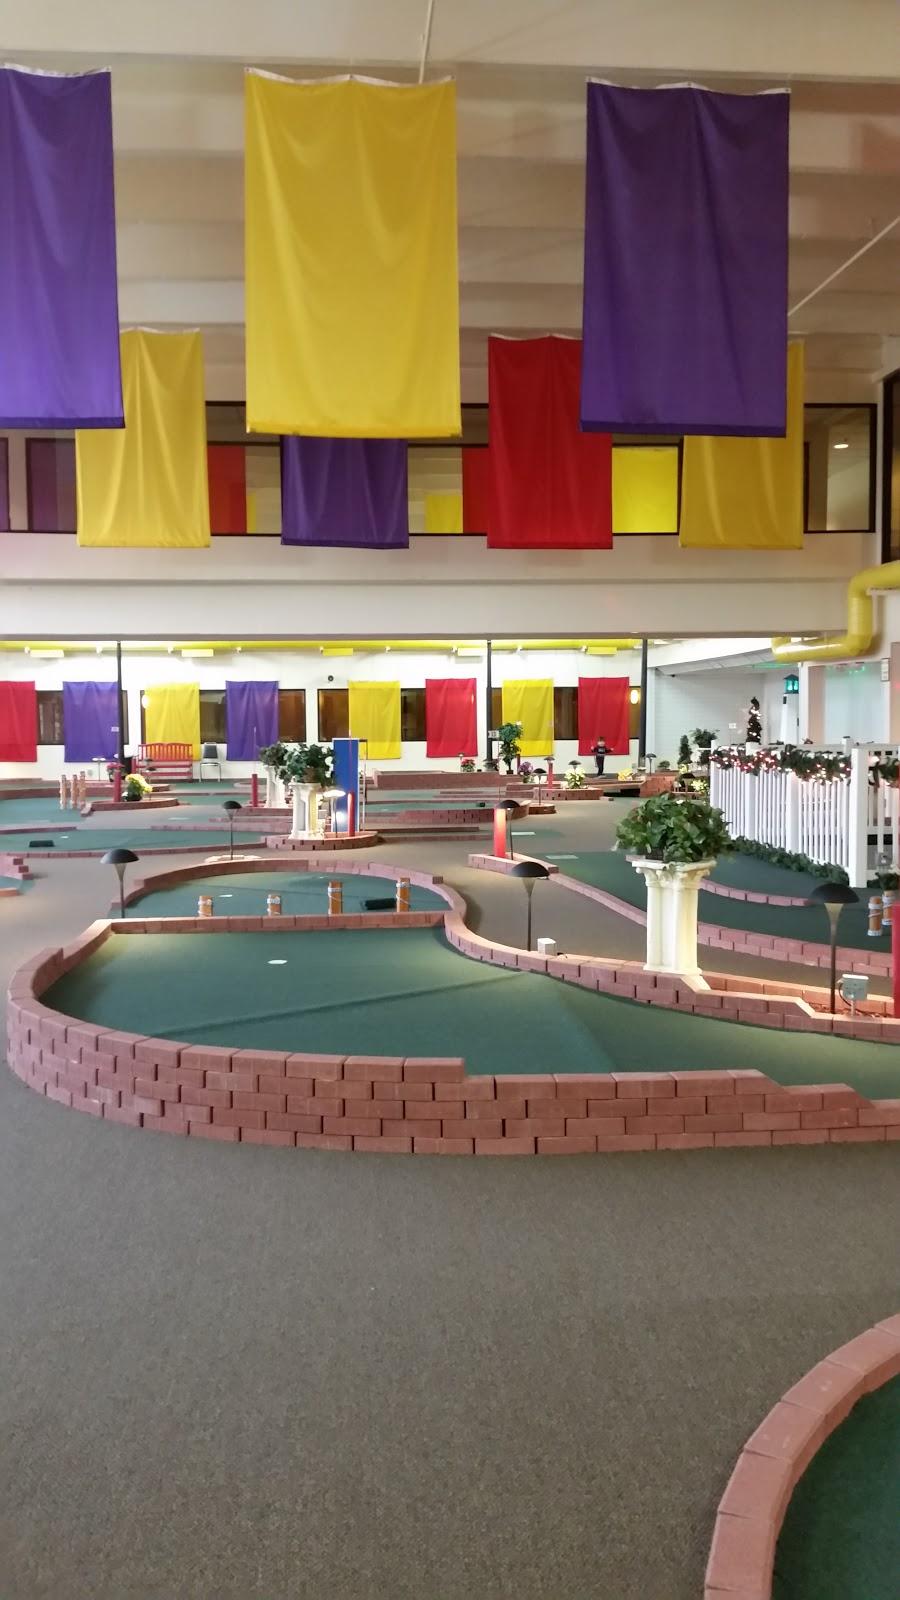 Rose Shores Athletic Club - health    Photo 4 of 9   Address: 31950 Little Mack Ave, Roseville, MI 48066, USA   Phone: (586) 296-2200